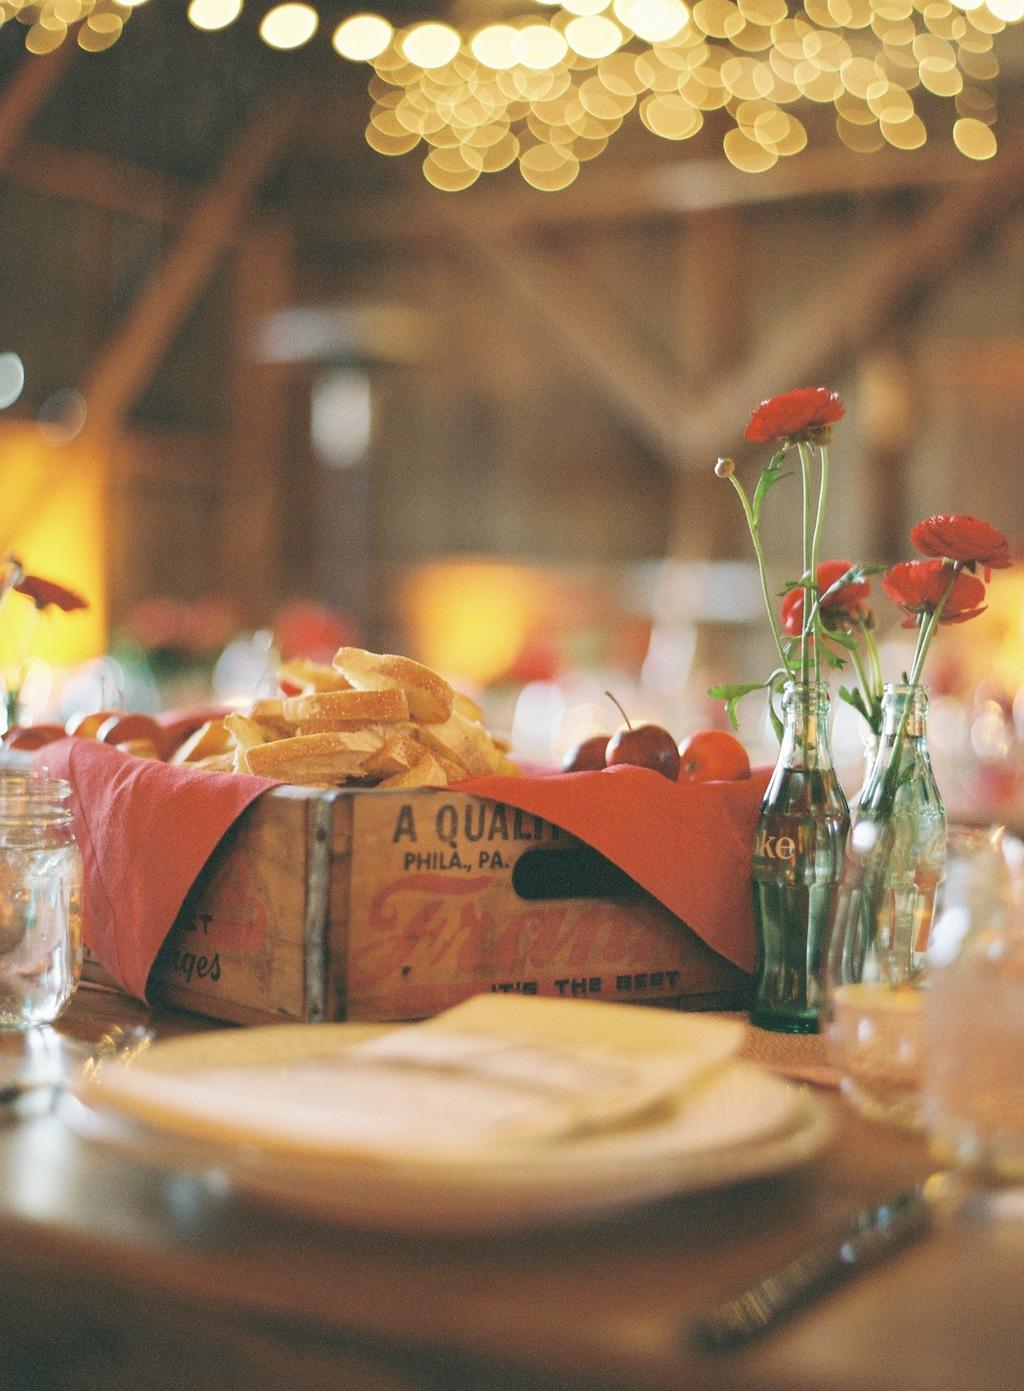 Wedding-barn-santa-barbara-chic-state-fair-jose-villa-table-setting-antique-bottles-retro-red-flowers-25.full